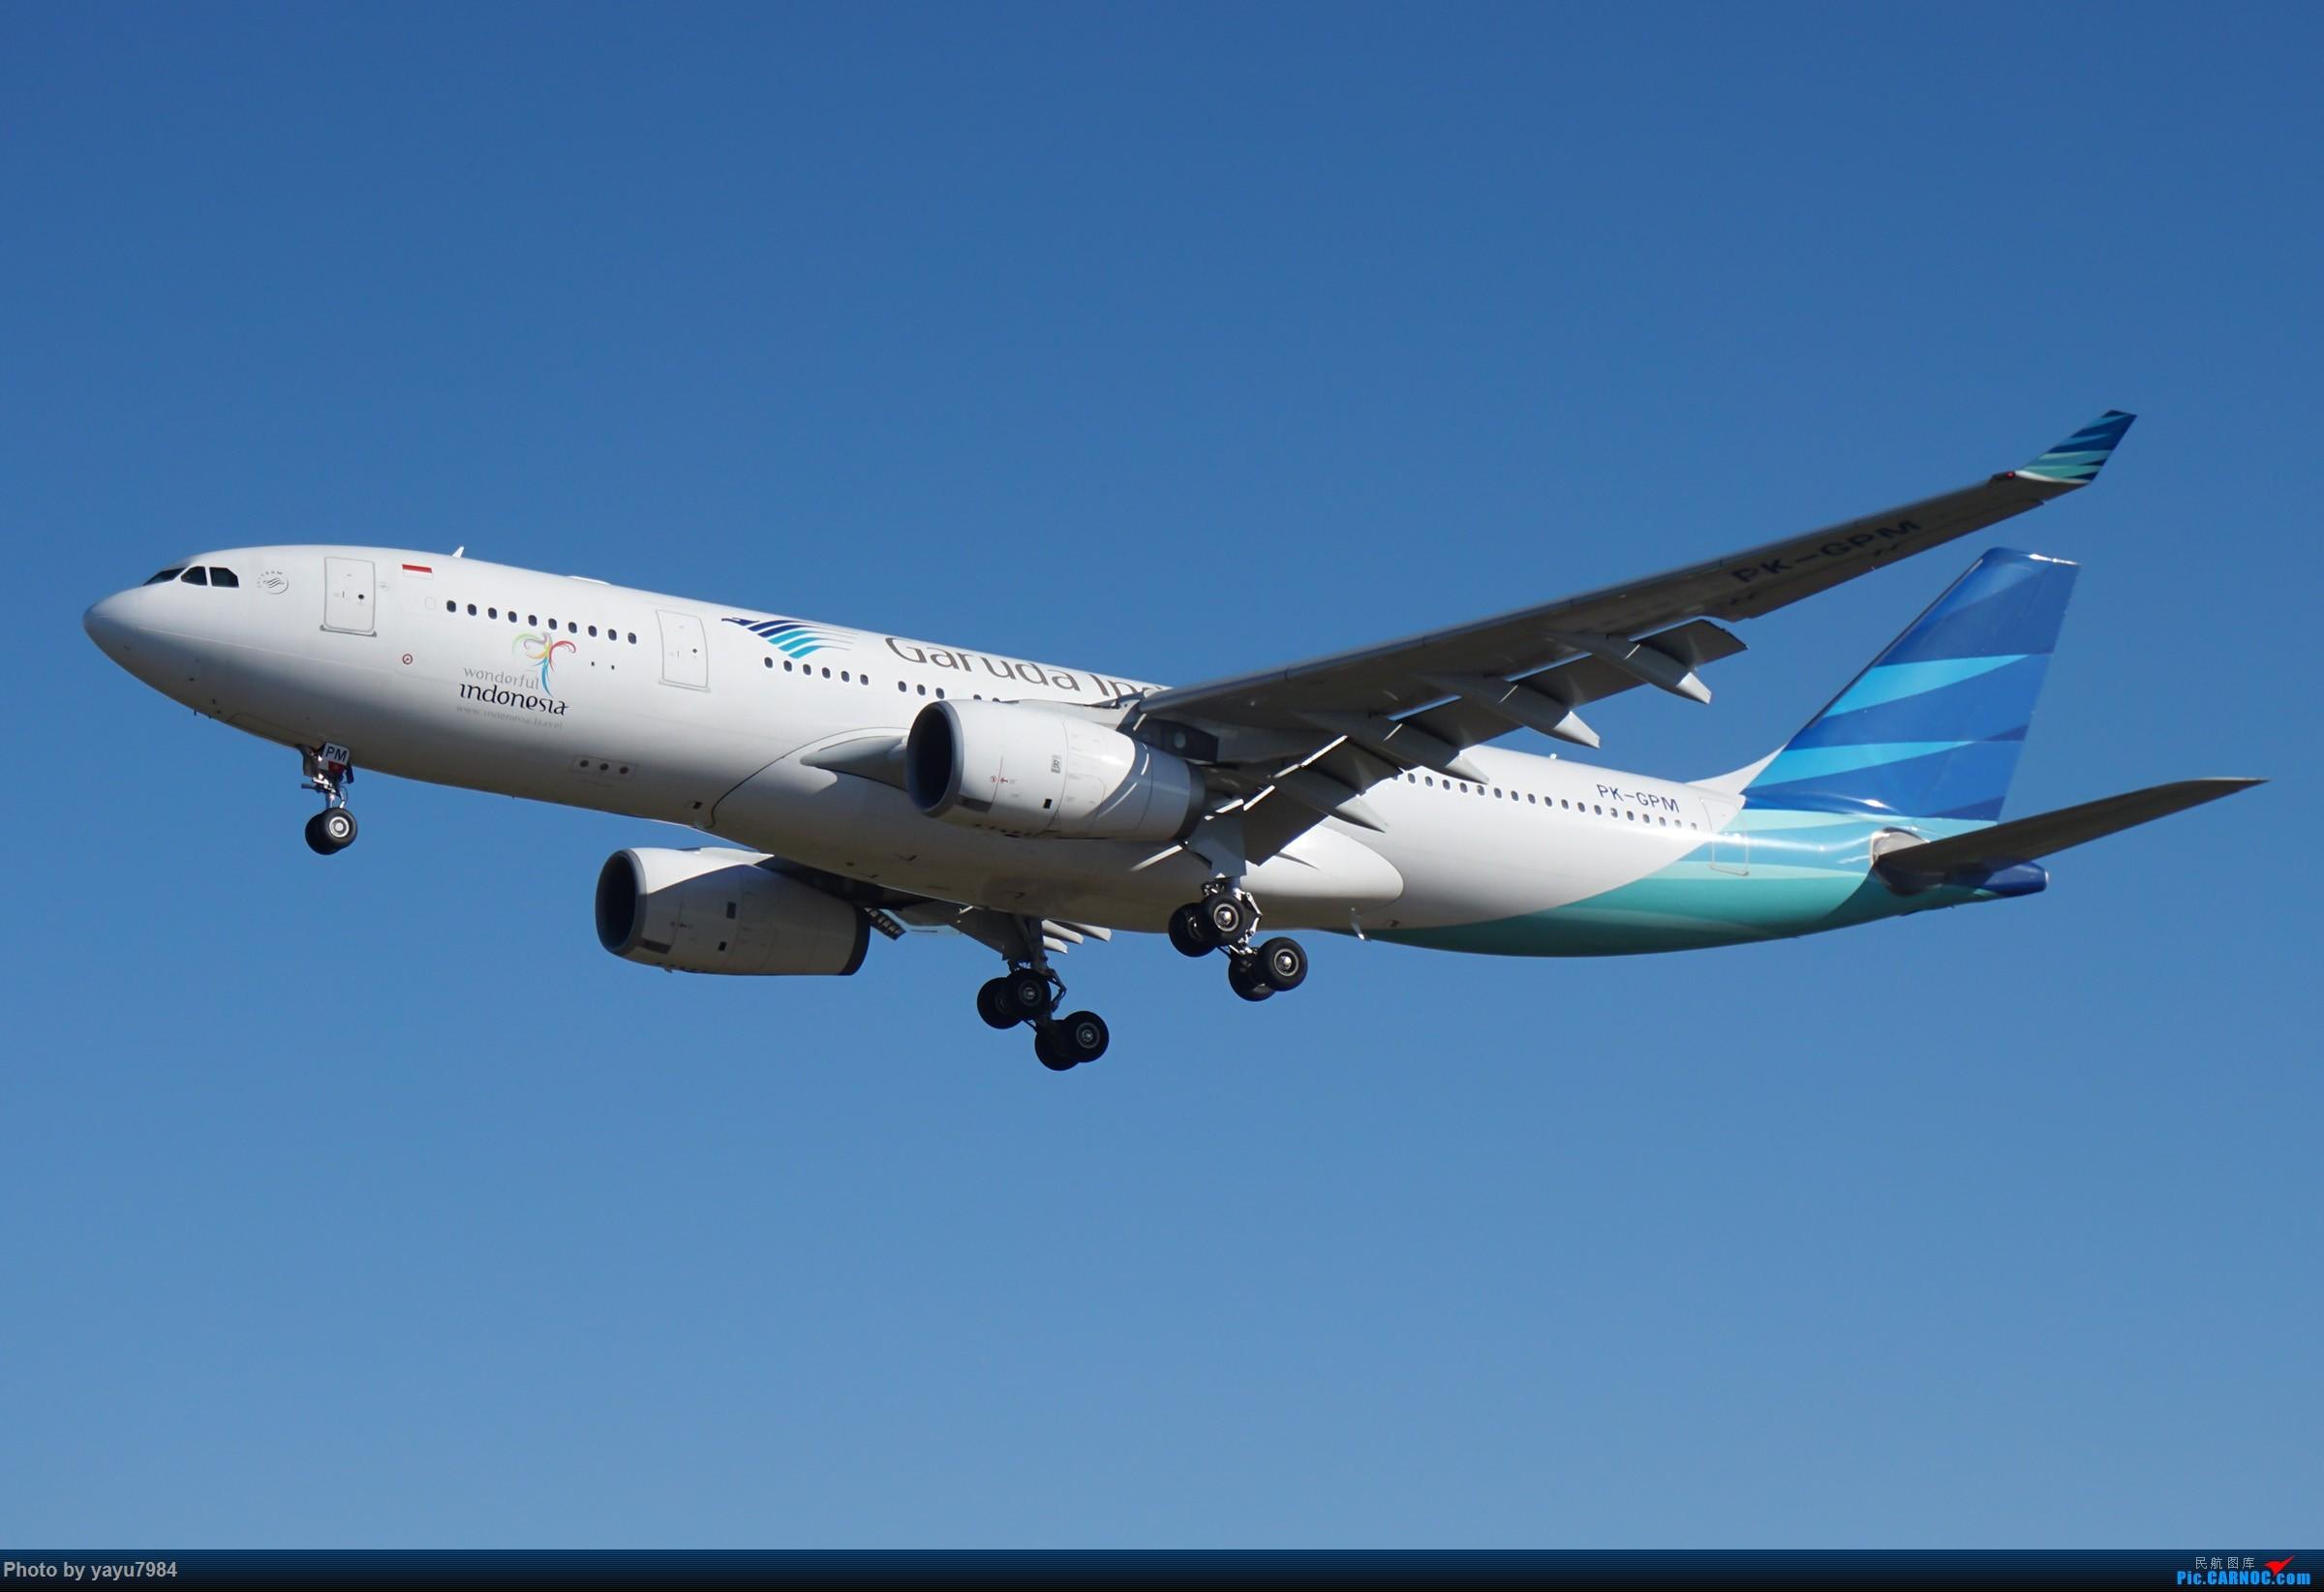 Re:[原创][SYD] 晨悉尼,16R扎堆到达 AIRBUS A330-200 PK-GPM 澳大利亚悉尼金斯福德·史密斯机场